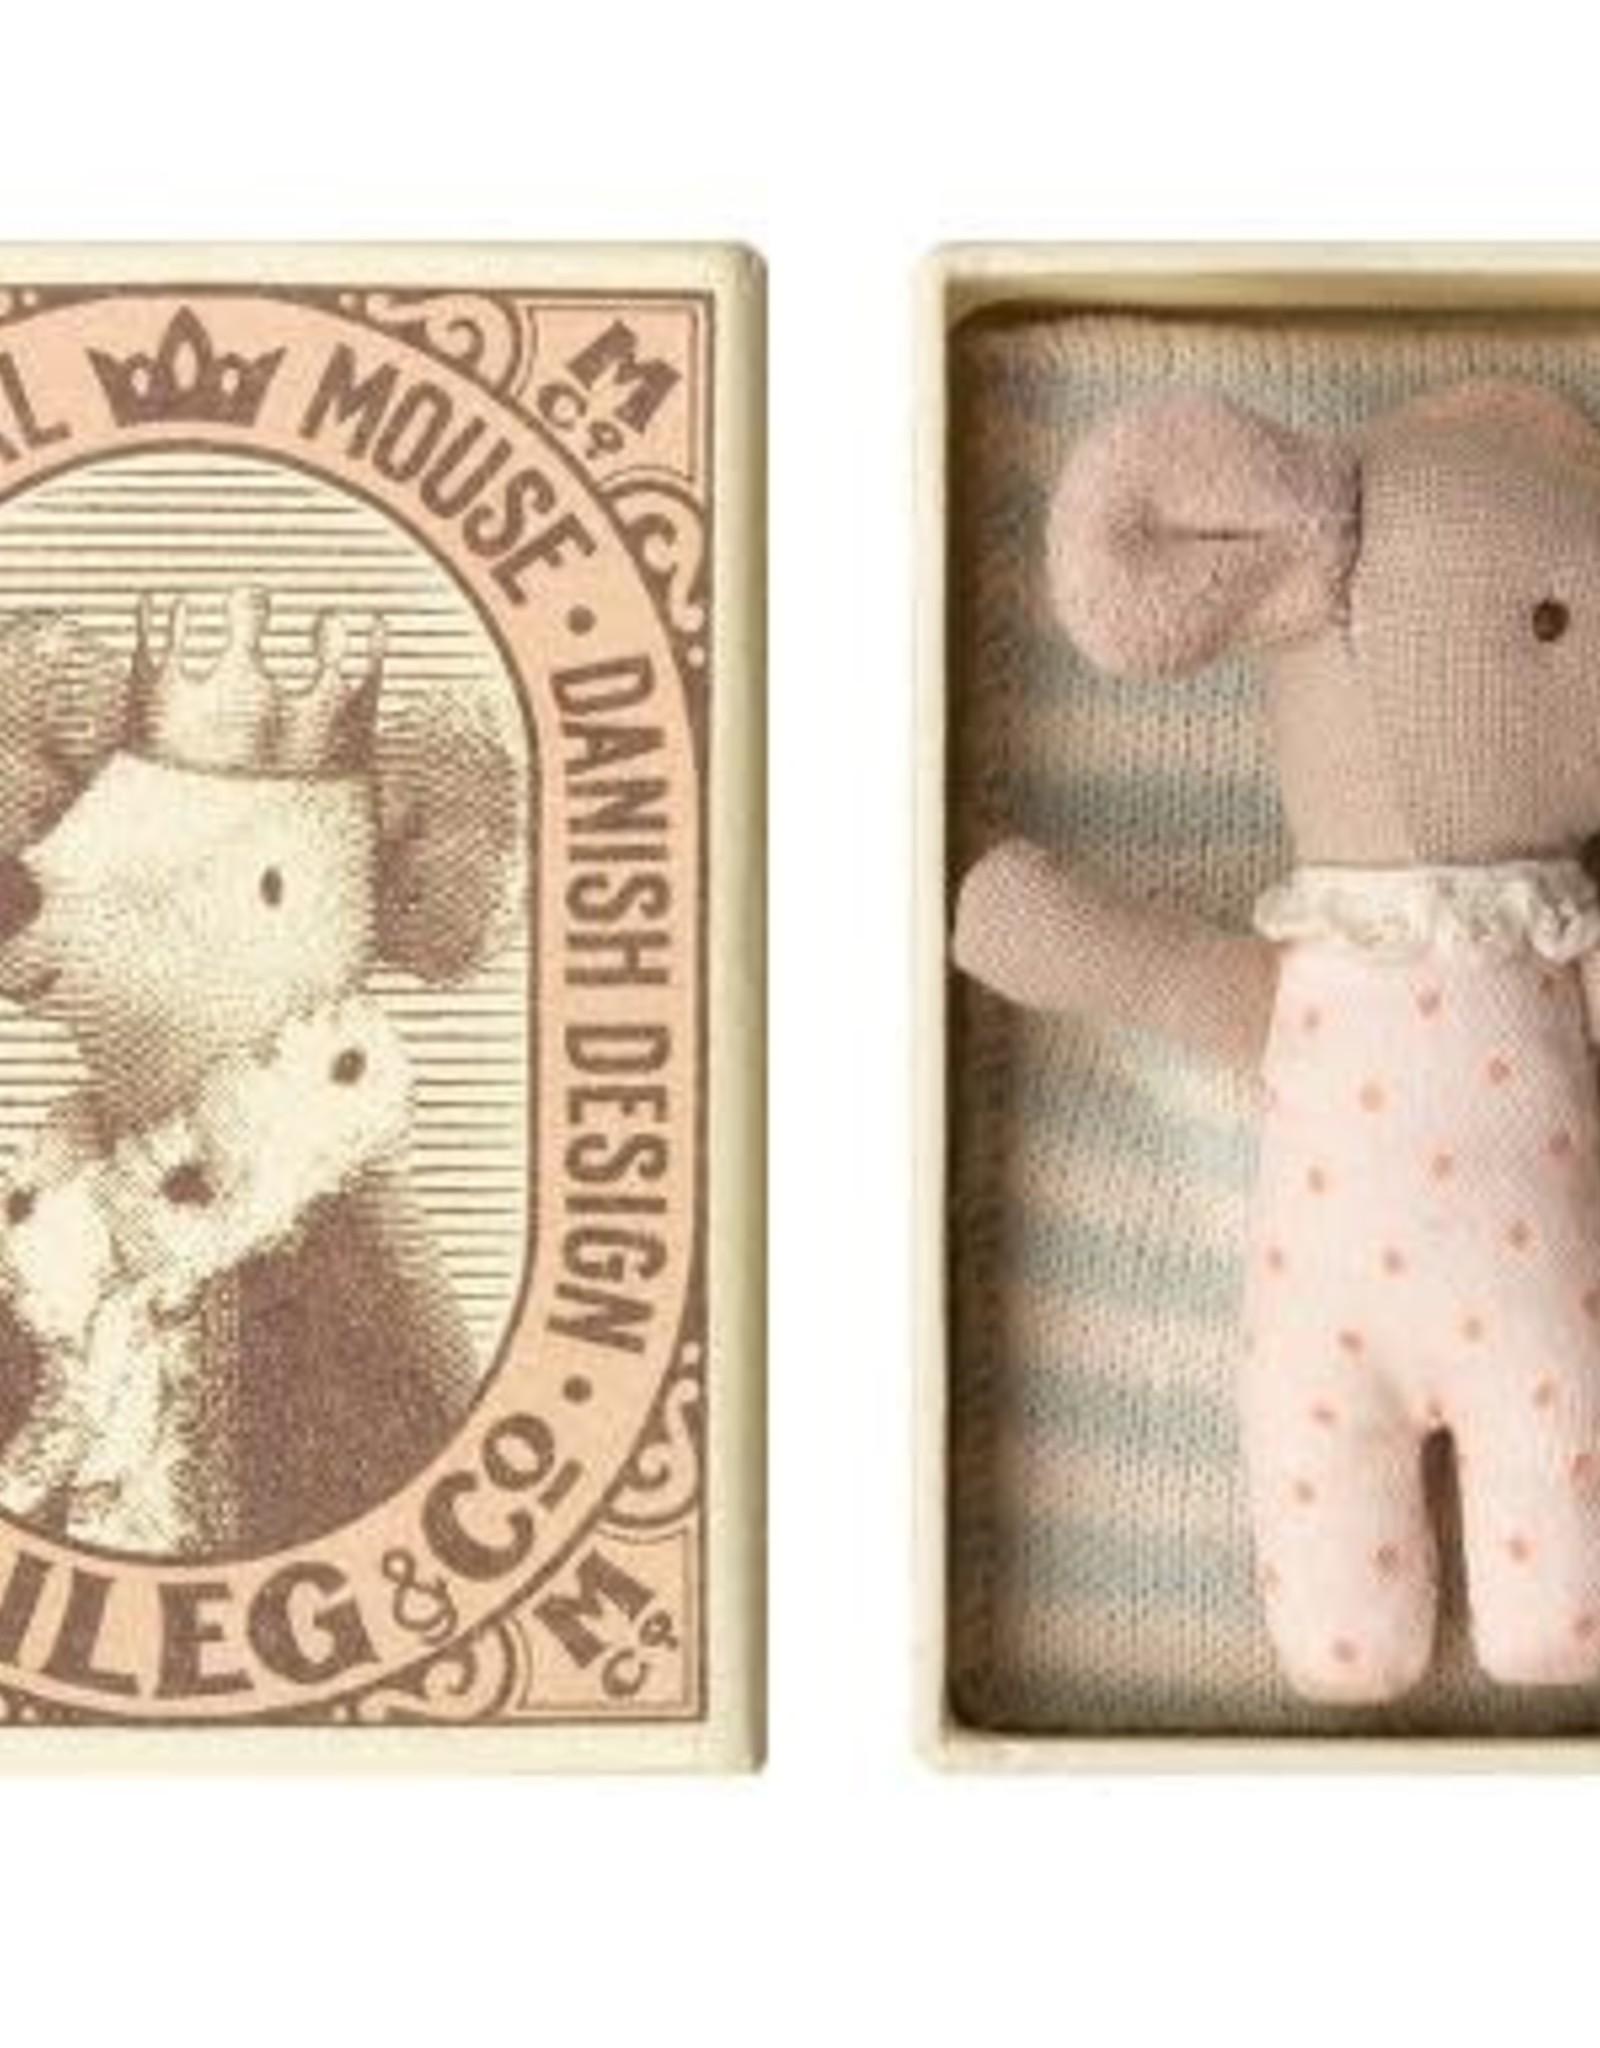 Maileg Sleepy-Wakey Mouse in box, girl